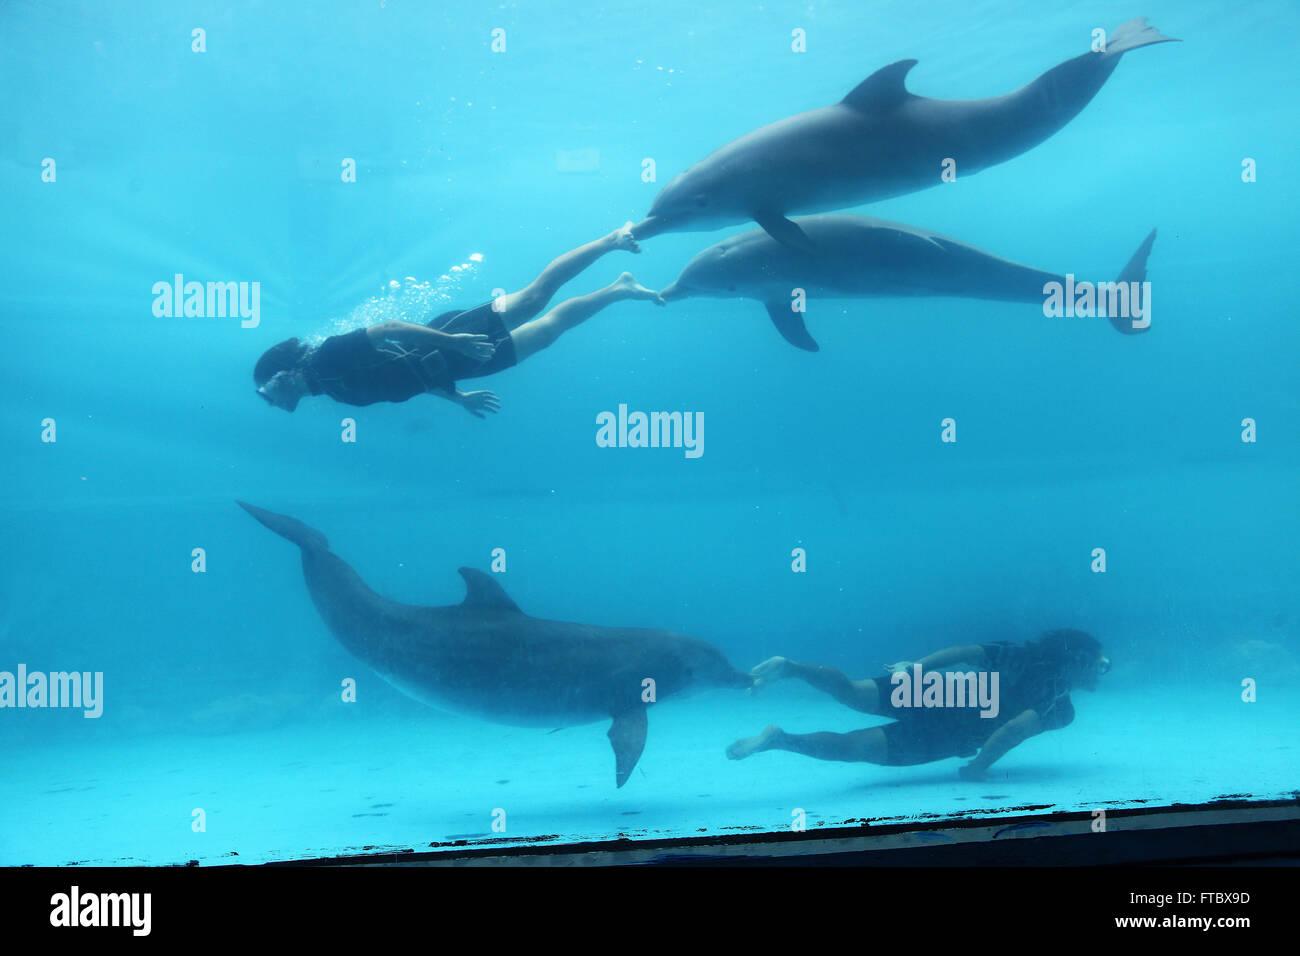 Kuba - September 2011: Havanna: Acuario Nacional - das Aquarium Delphin Stockbild